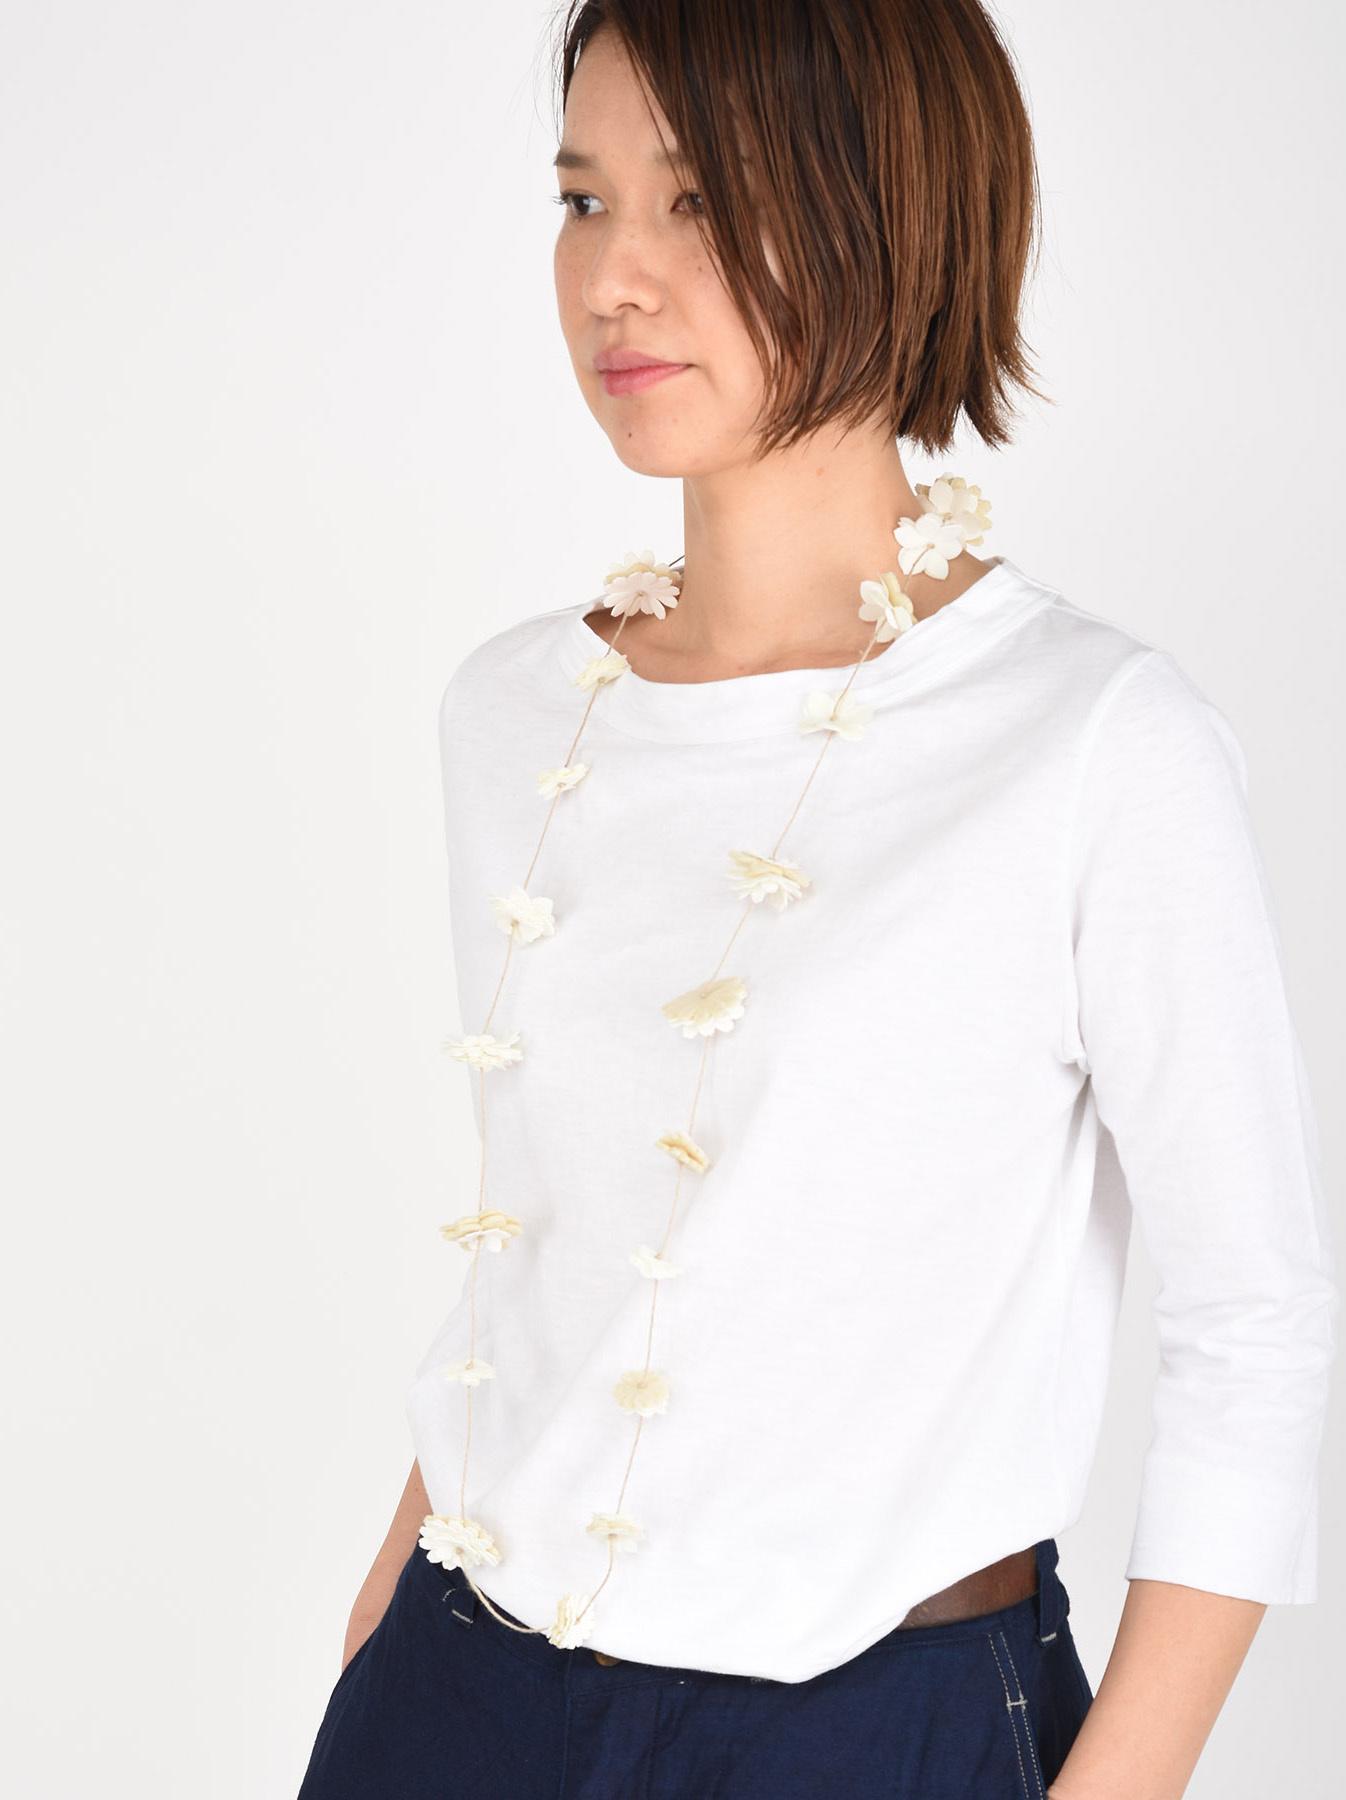 Felt Flower Necklace-2